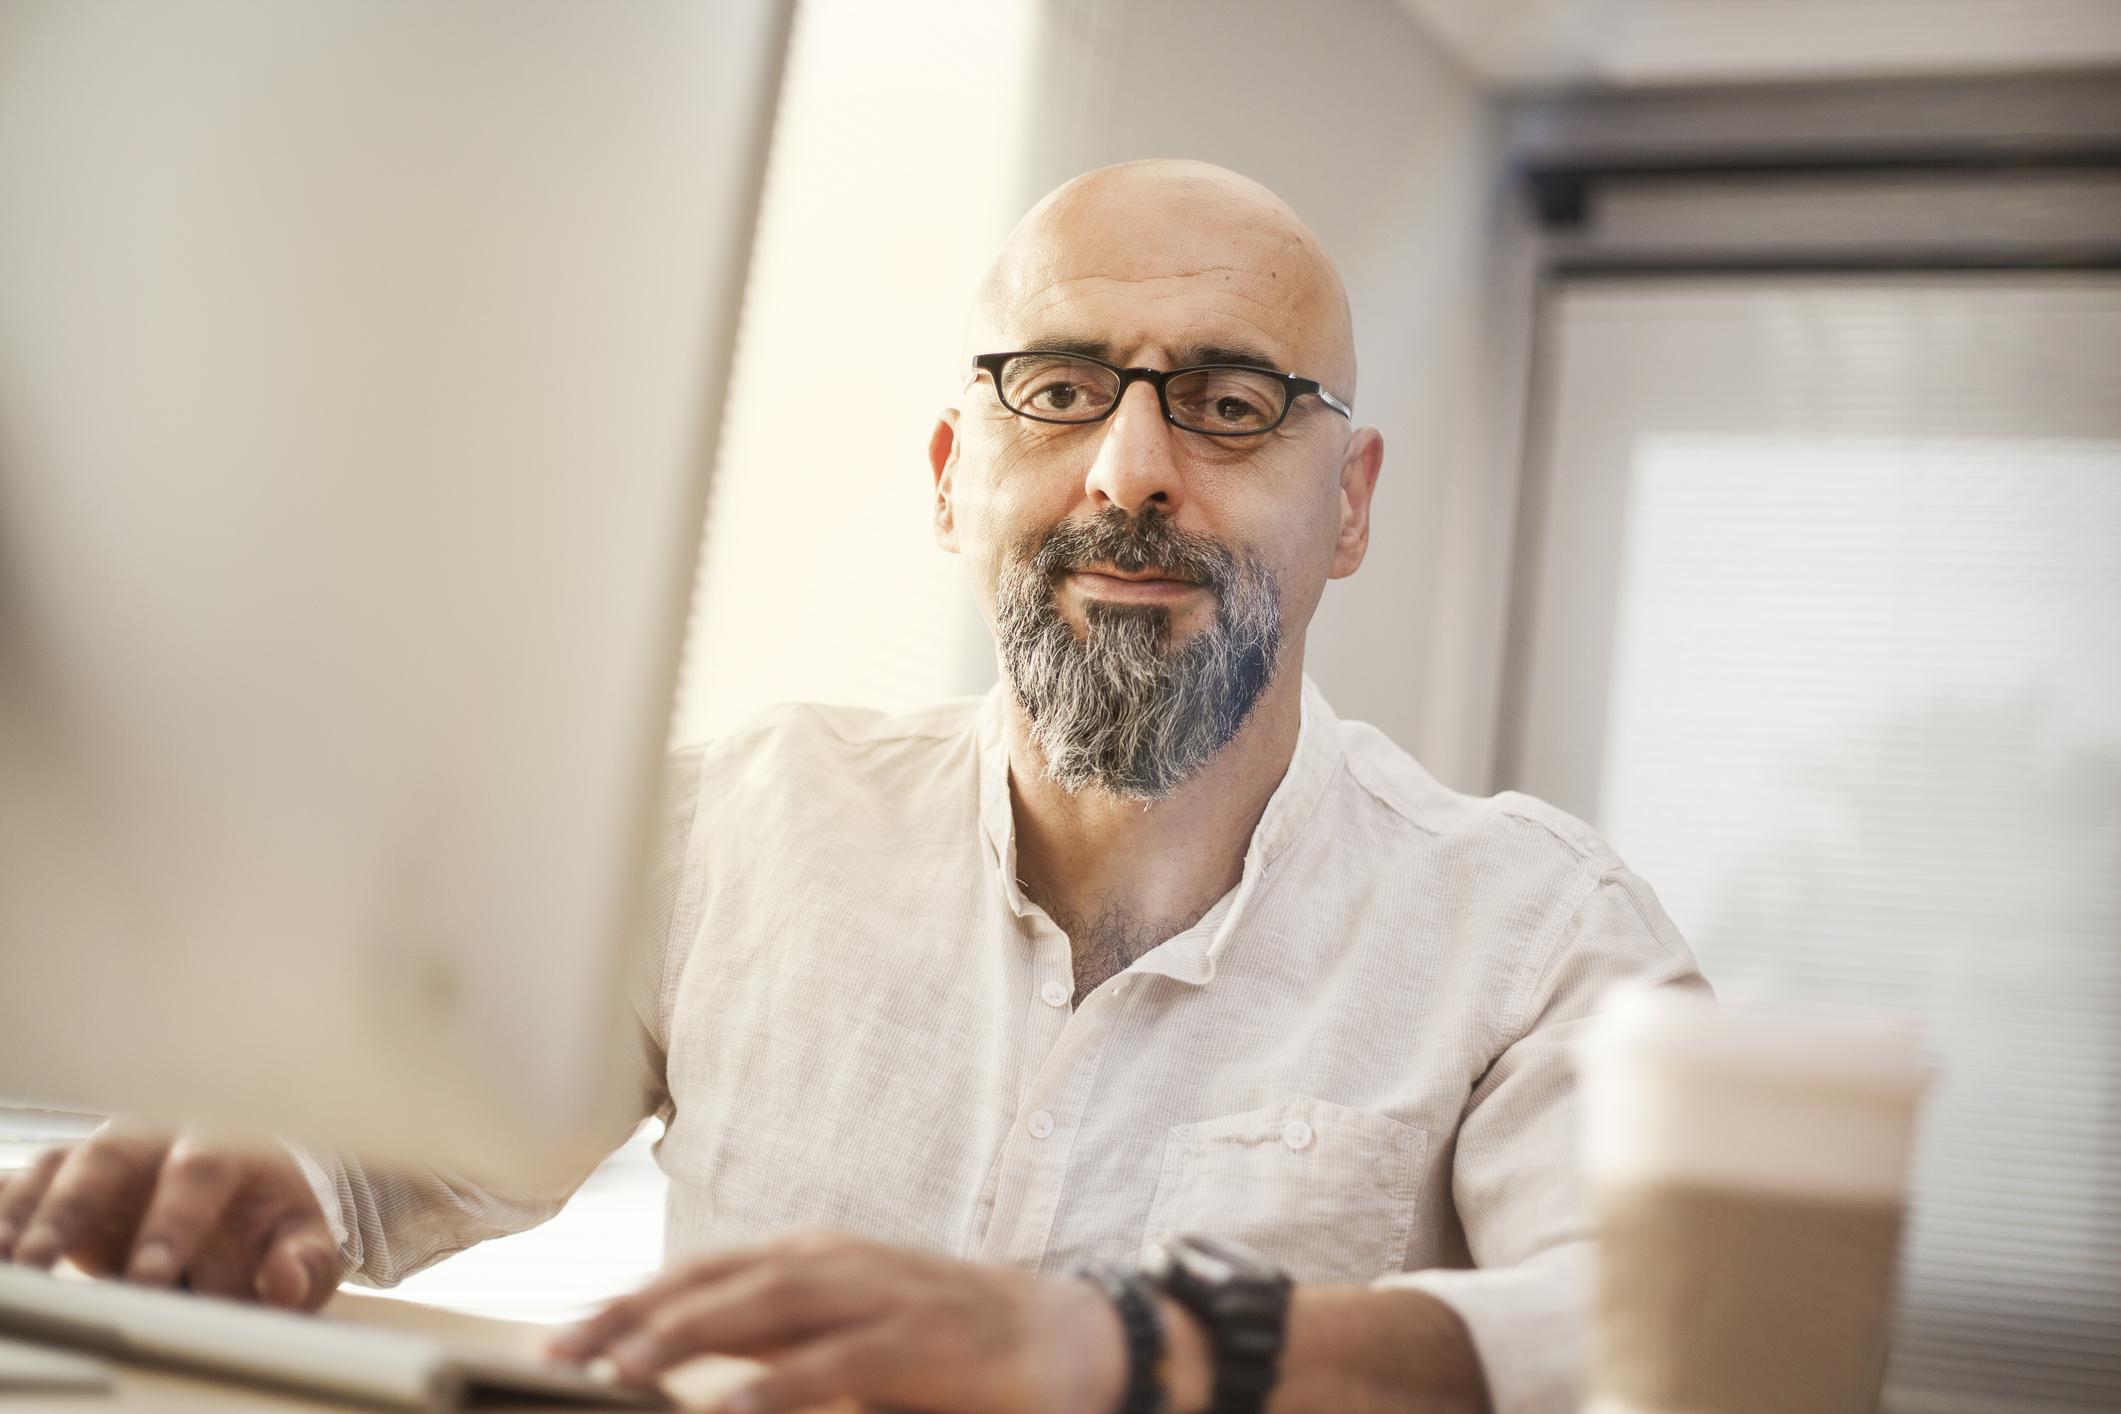 Senior-businessman-working-on-computer-599679264_2125x1416.jpeg